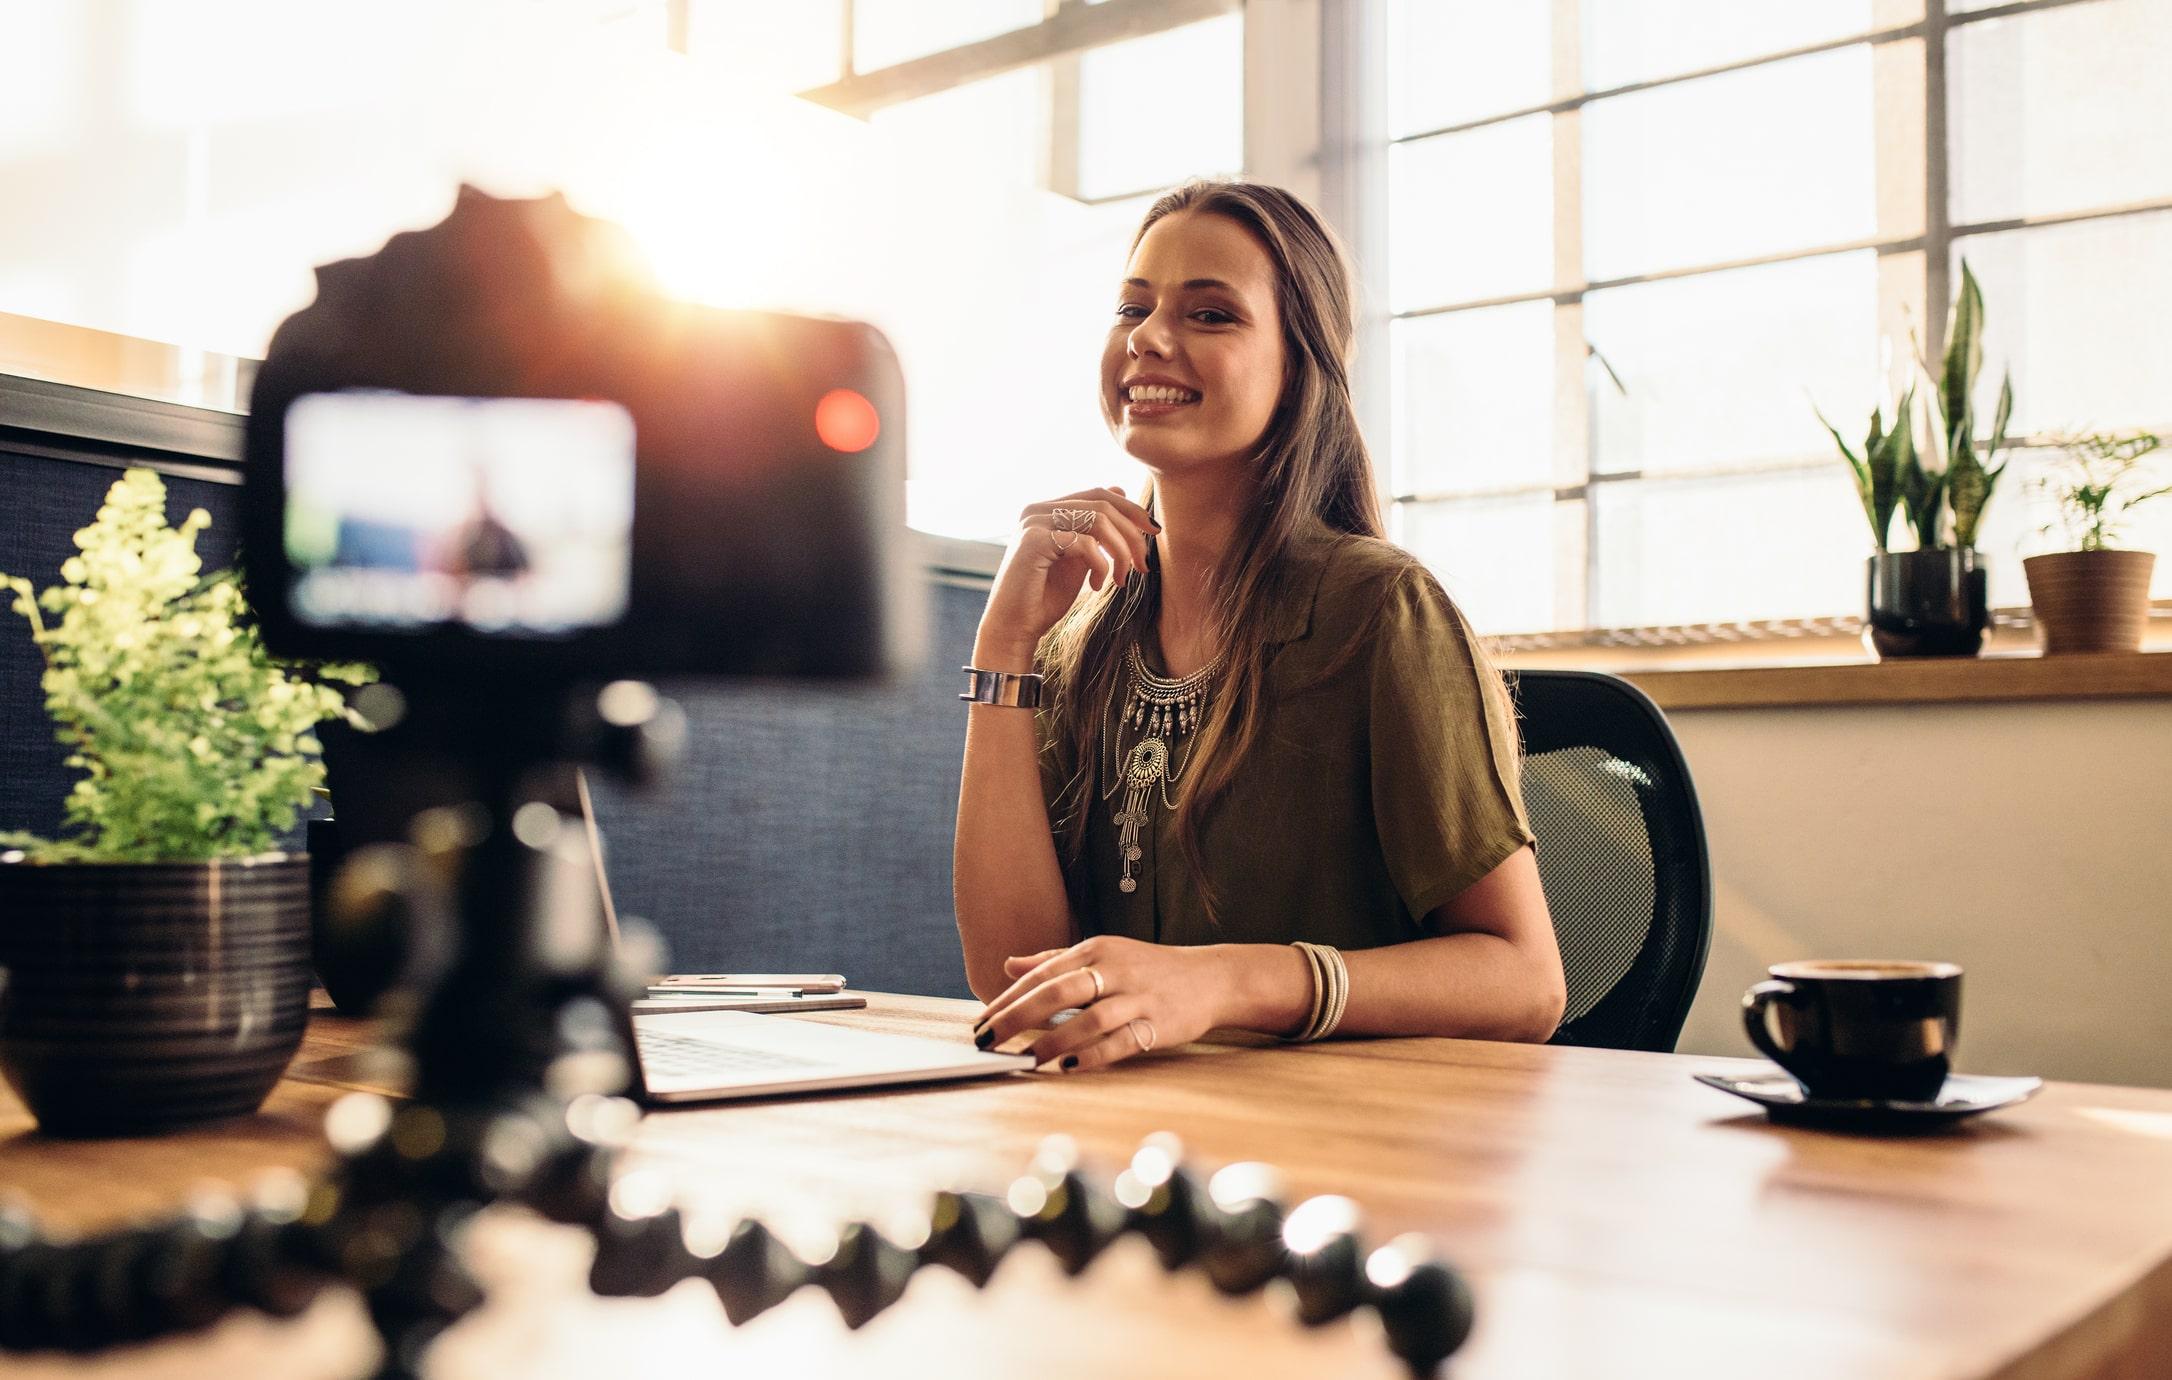 basic composition tips for beginner videographers image